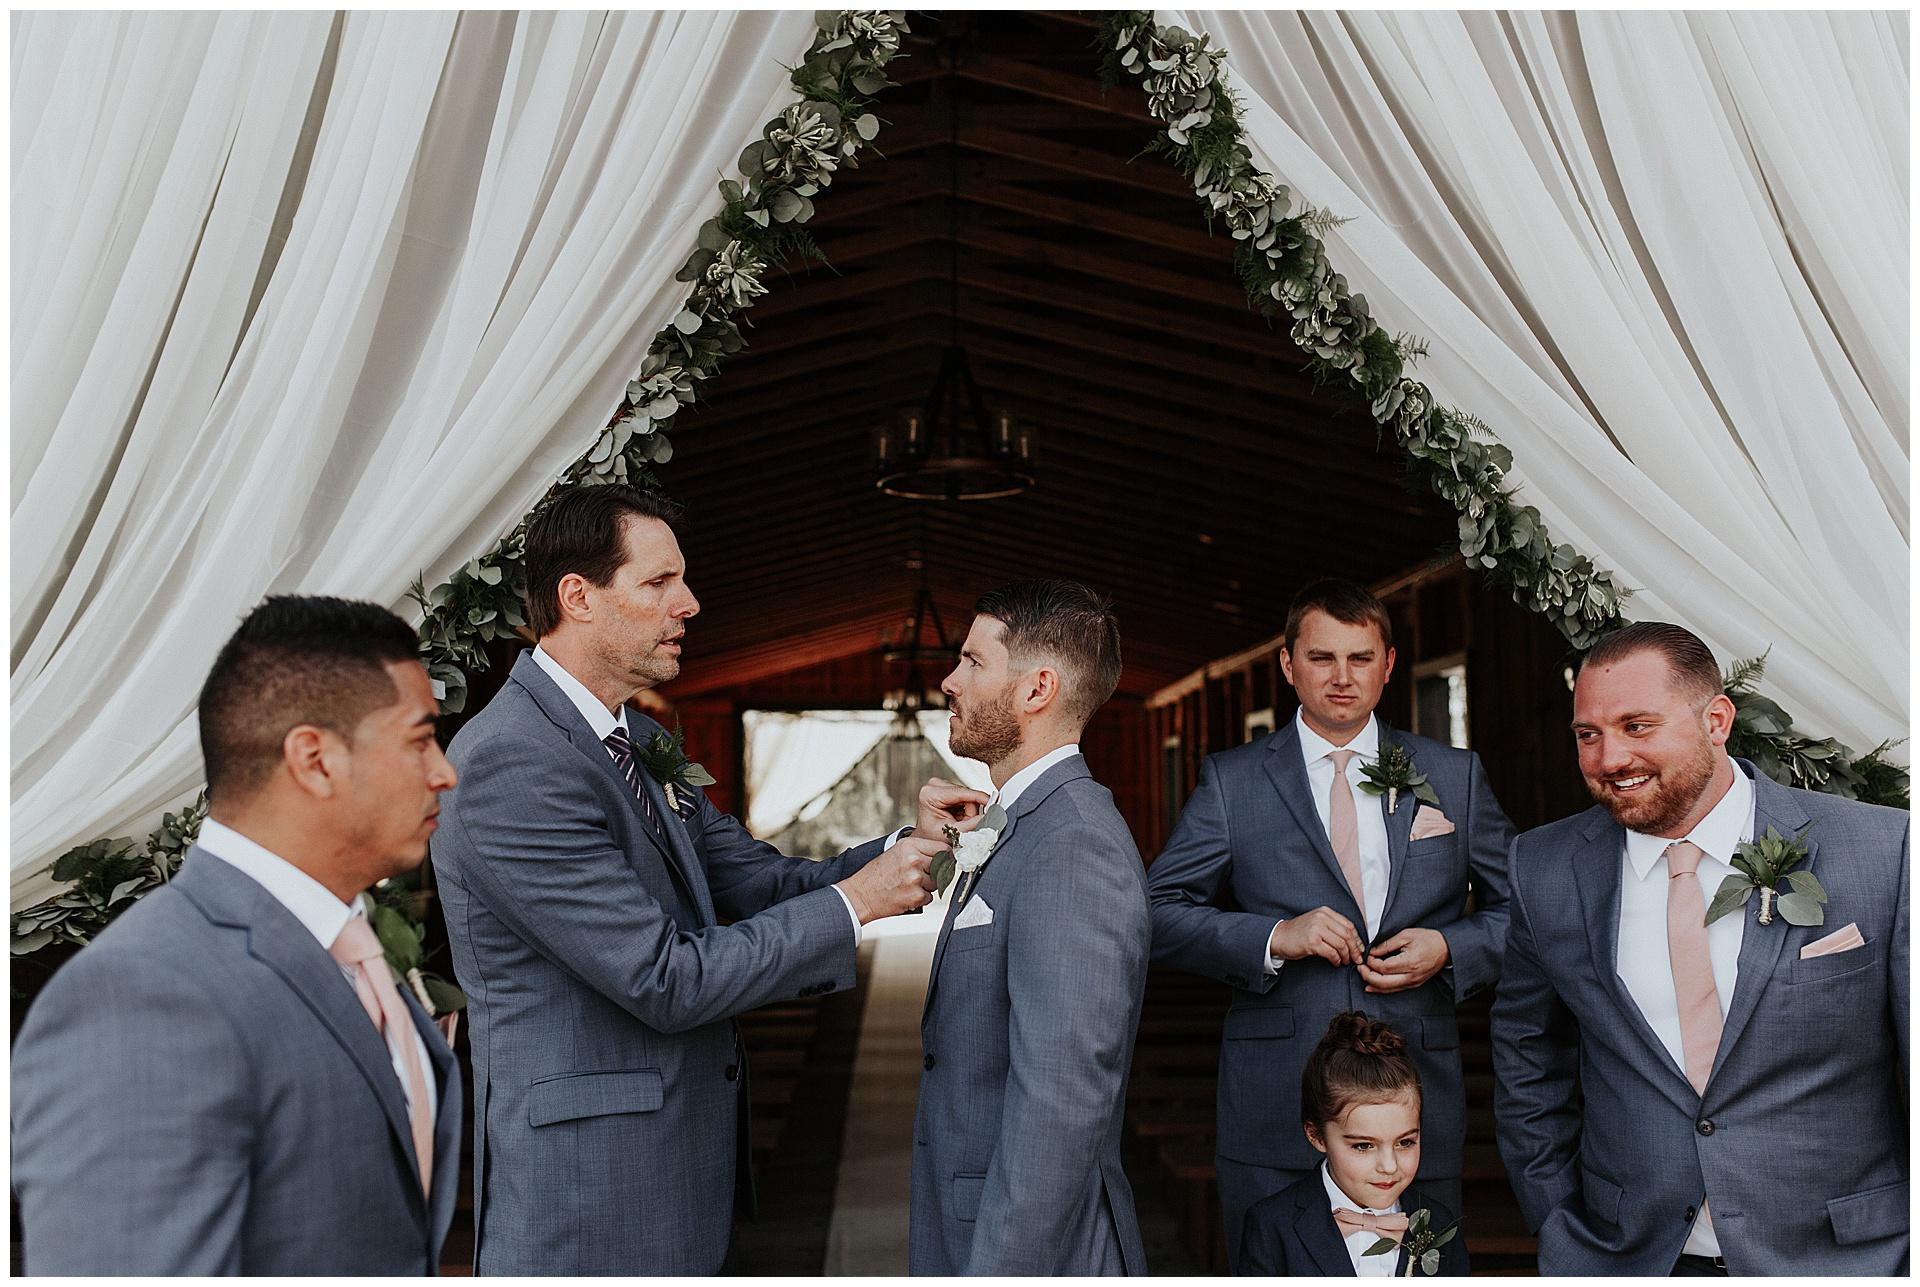 st augustine wedding photographer_mia dimare photography8.jpg